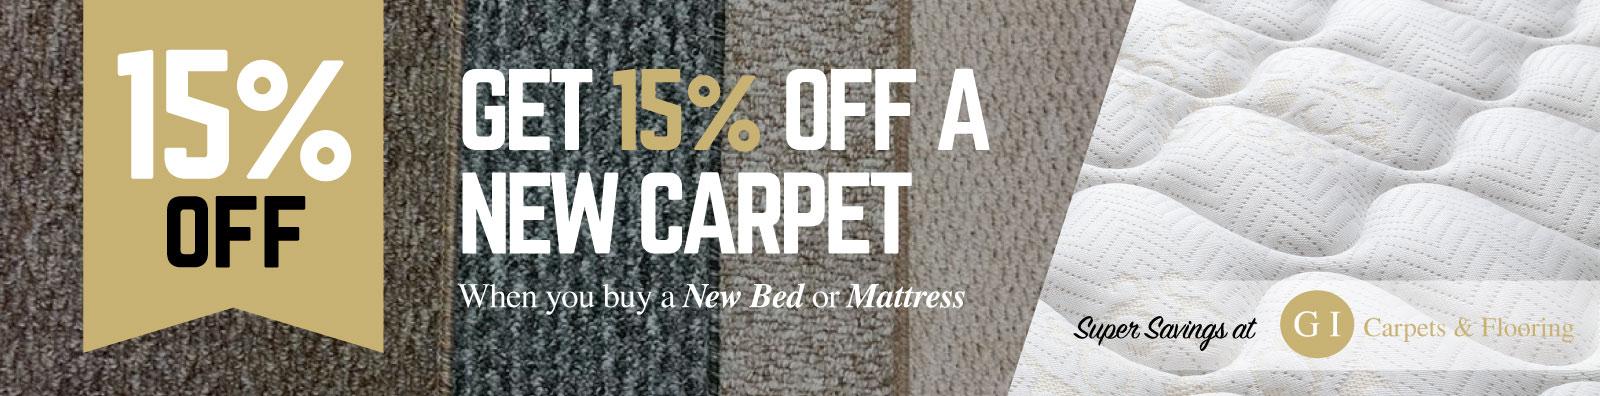 GI-Carpets-Llanelli-Carpets-March-Promo-Banner